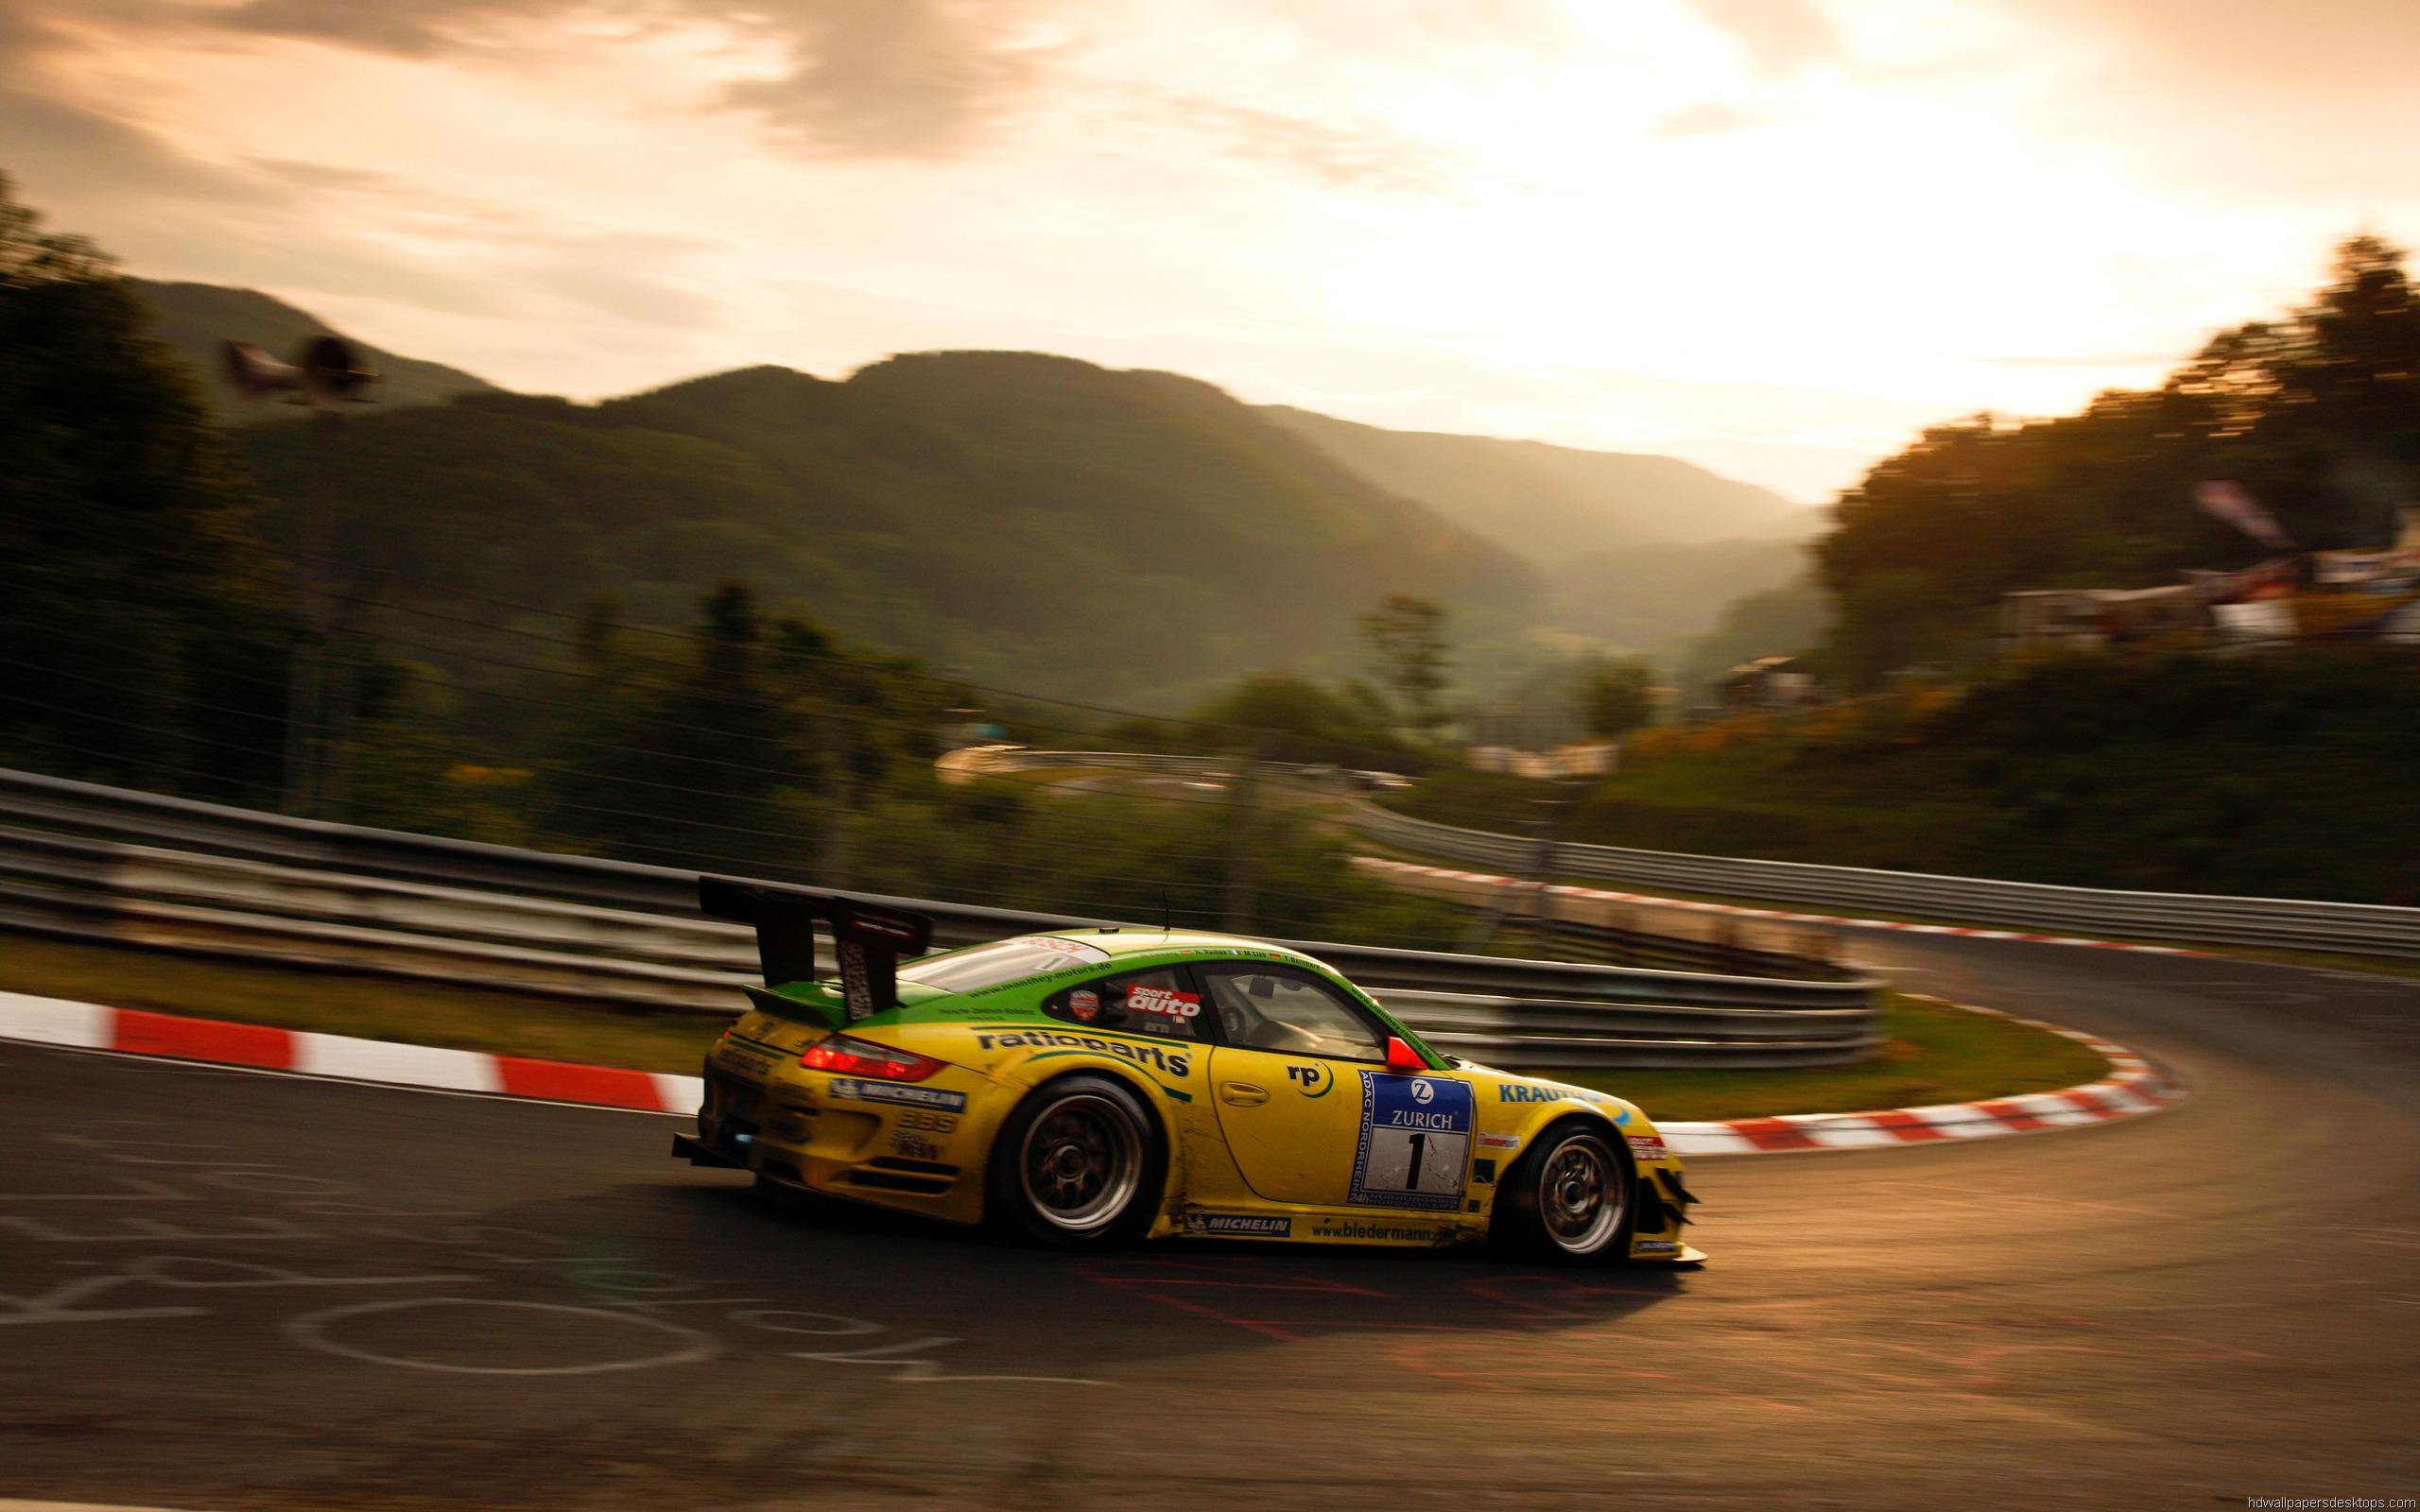 Hd Race Car Wallpaper Wallpapersafari